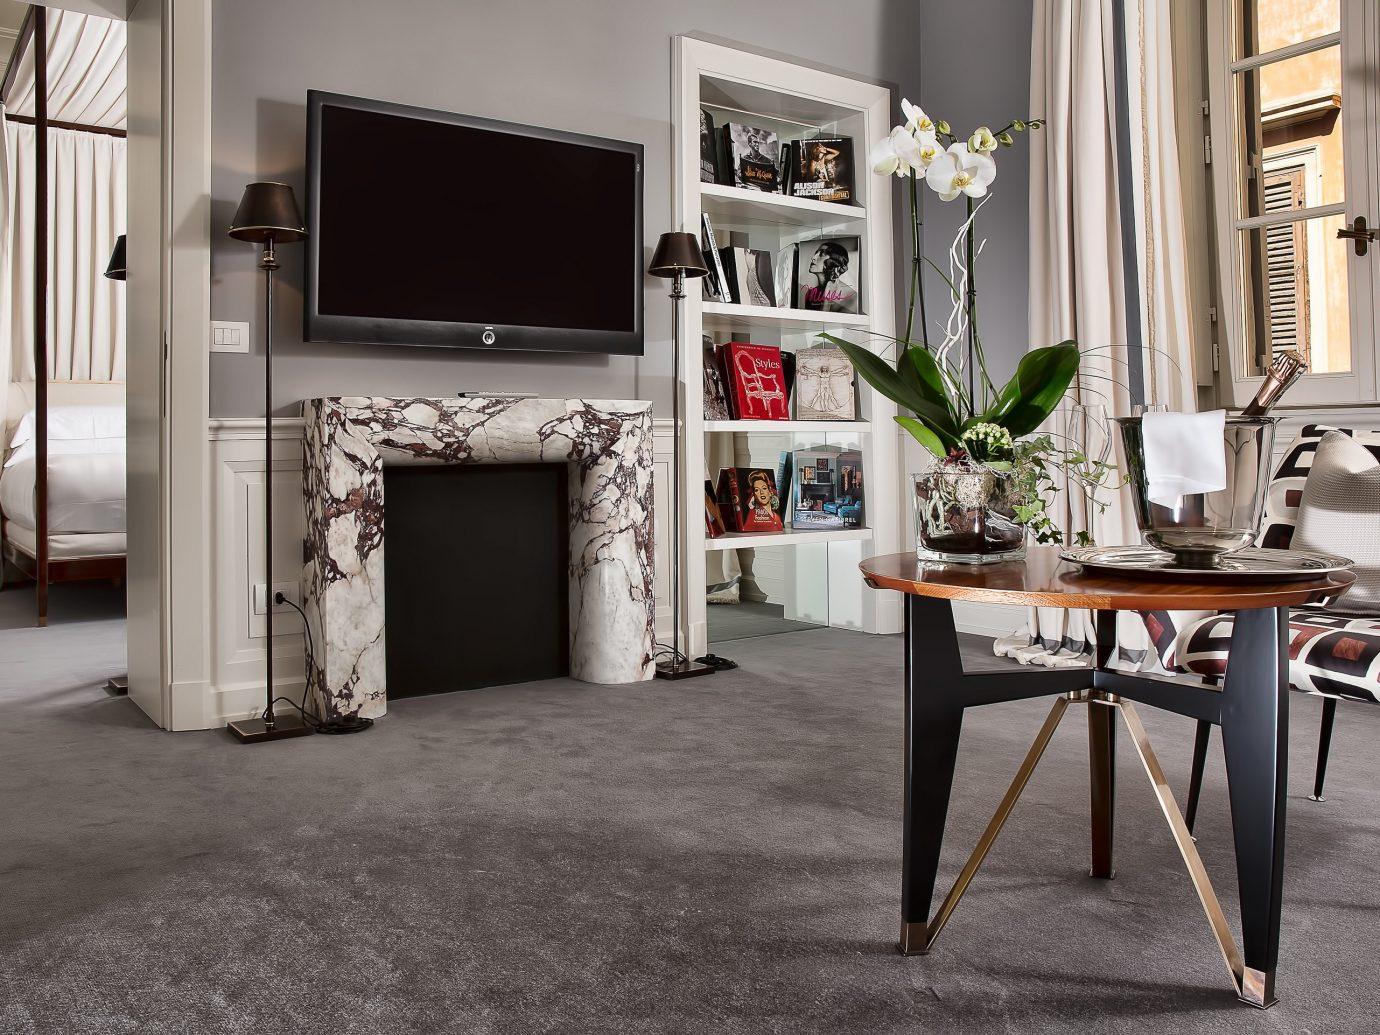 Hotels floor indoor Living room home living room house flooring interior design furniture dining room wood Design estate table hall